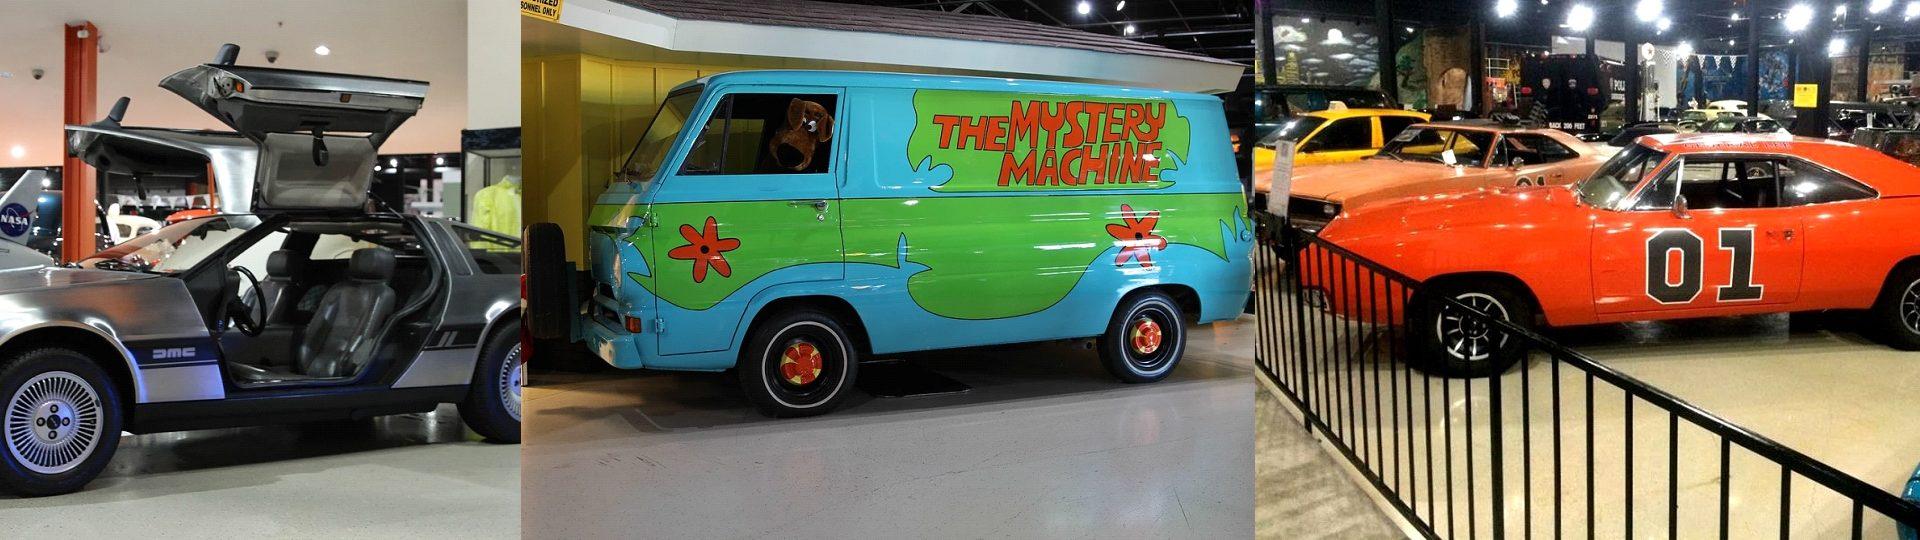 Celebrity Car Museum (Branson) - Call: 1 (800) 504-0115 - Branson ...